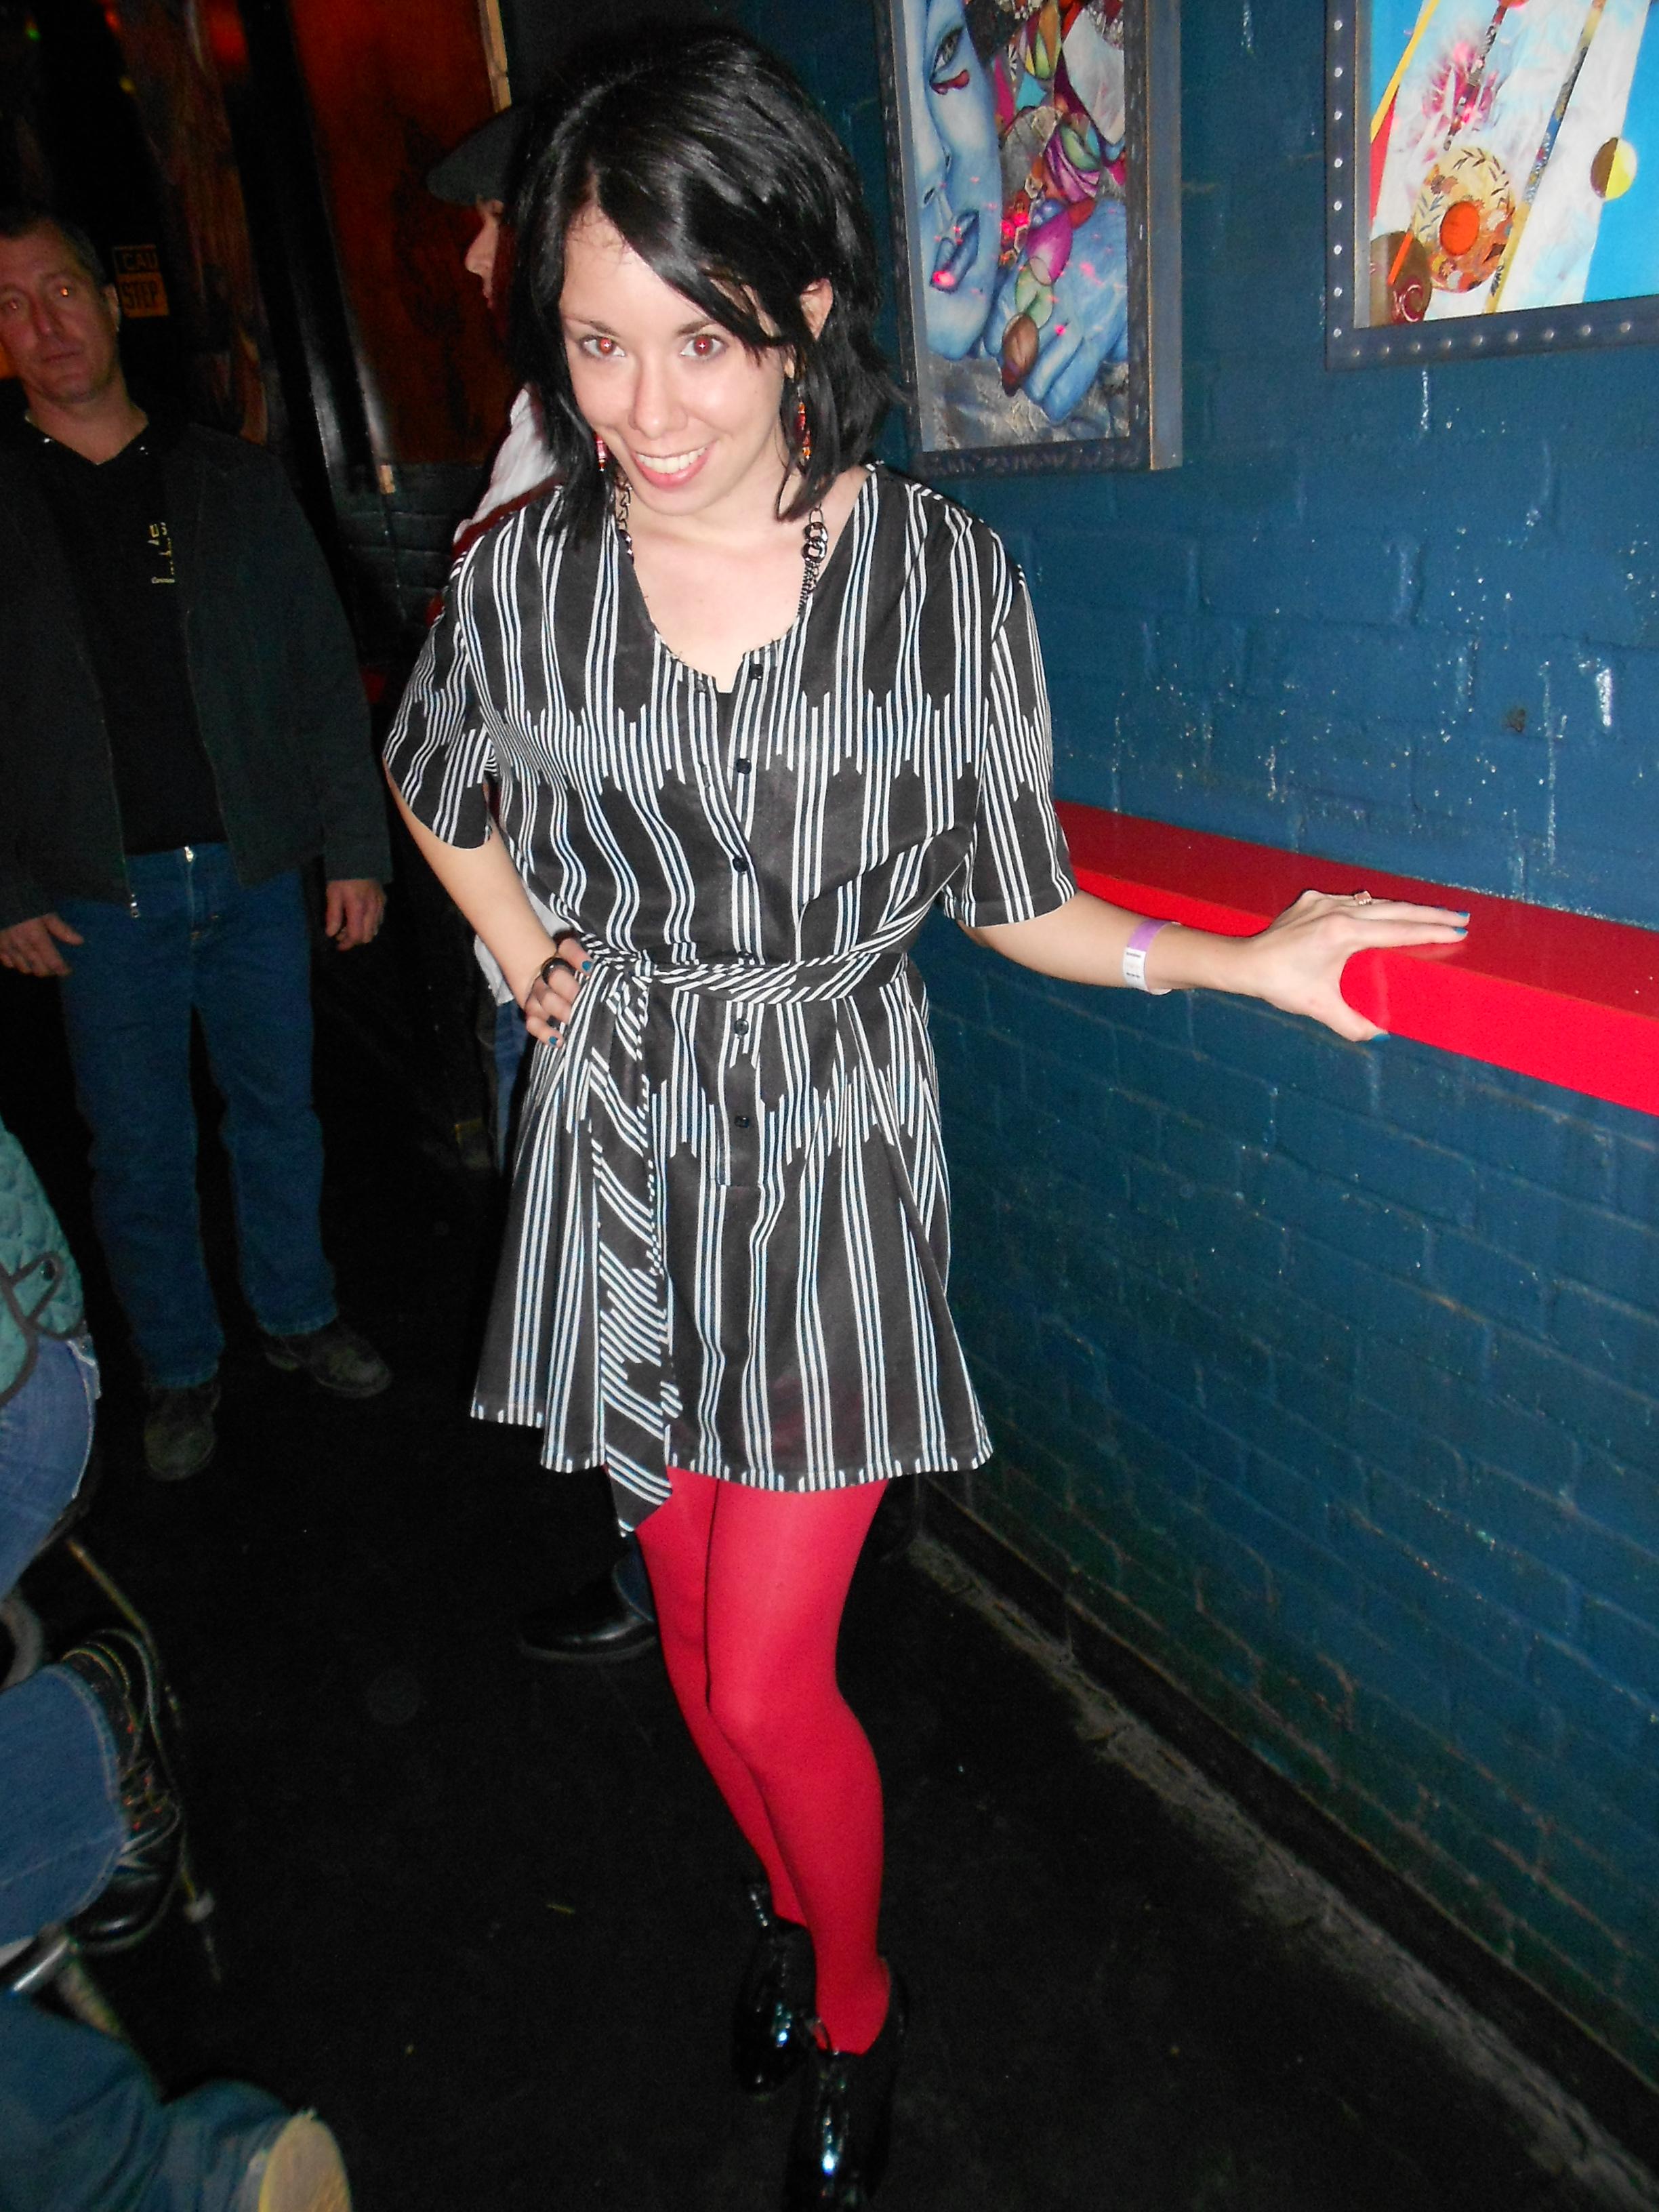 Day 226: Art Dec-oh! Dress 10